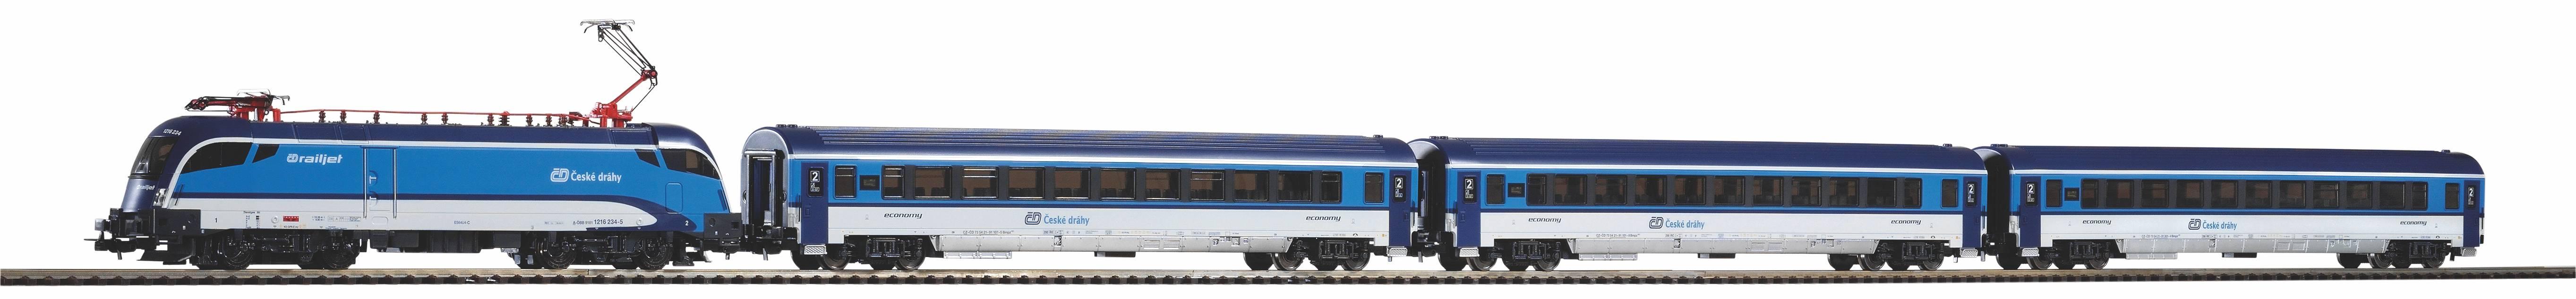 Piko Startovací sada Osobní vlak Taurus Railjet IC ČD VI - 57179